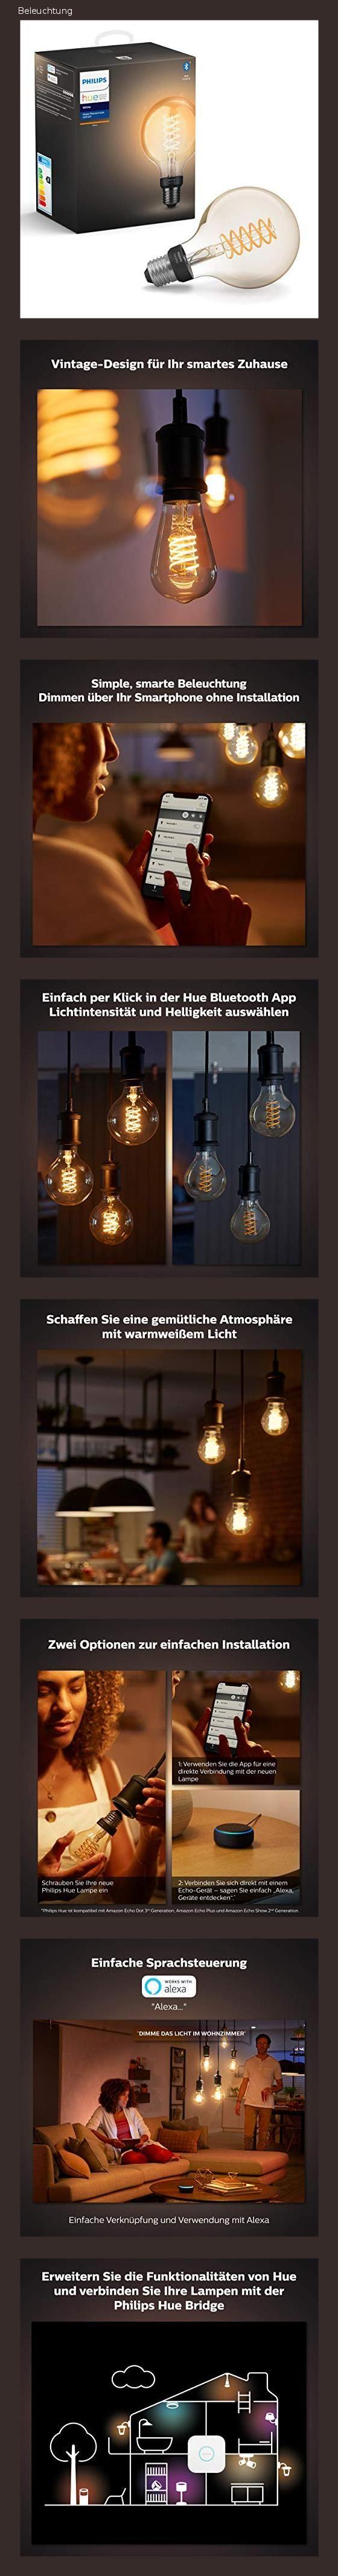 Philips Hue White Filament E27 Led Globe Dimmbar Vintage Design Warmweisses Licht Steuerbar Vi In 2020 Led Hue Design